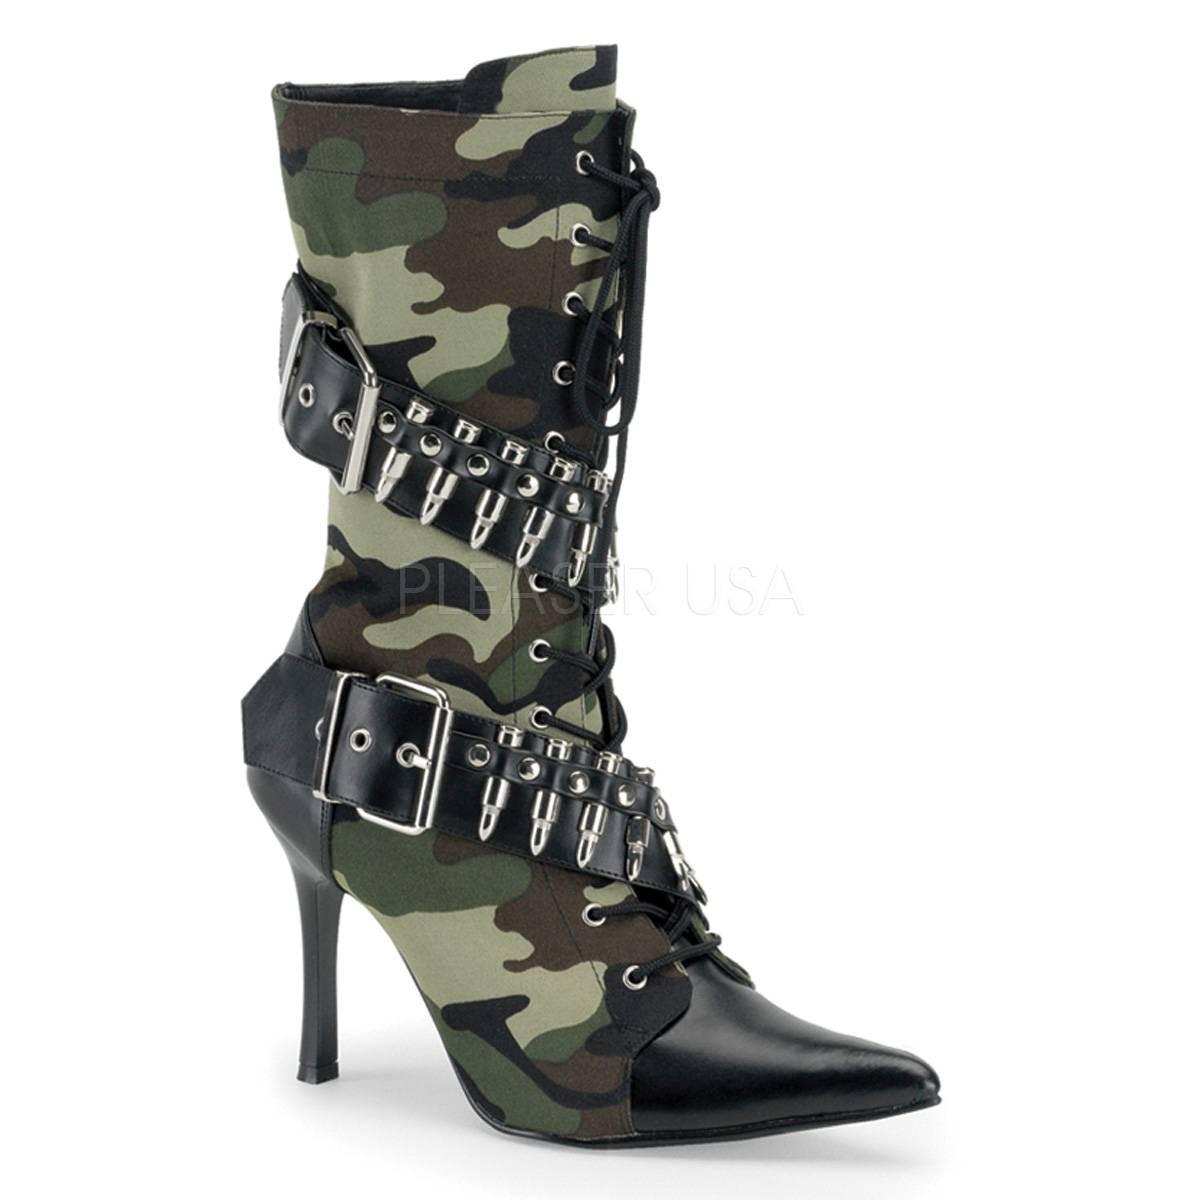 Stiefel - MILITANT 128 ° Damen Military Boots ° Grün Braun Matt ° Funtasma  - Onlineshop RedSixty